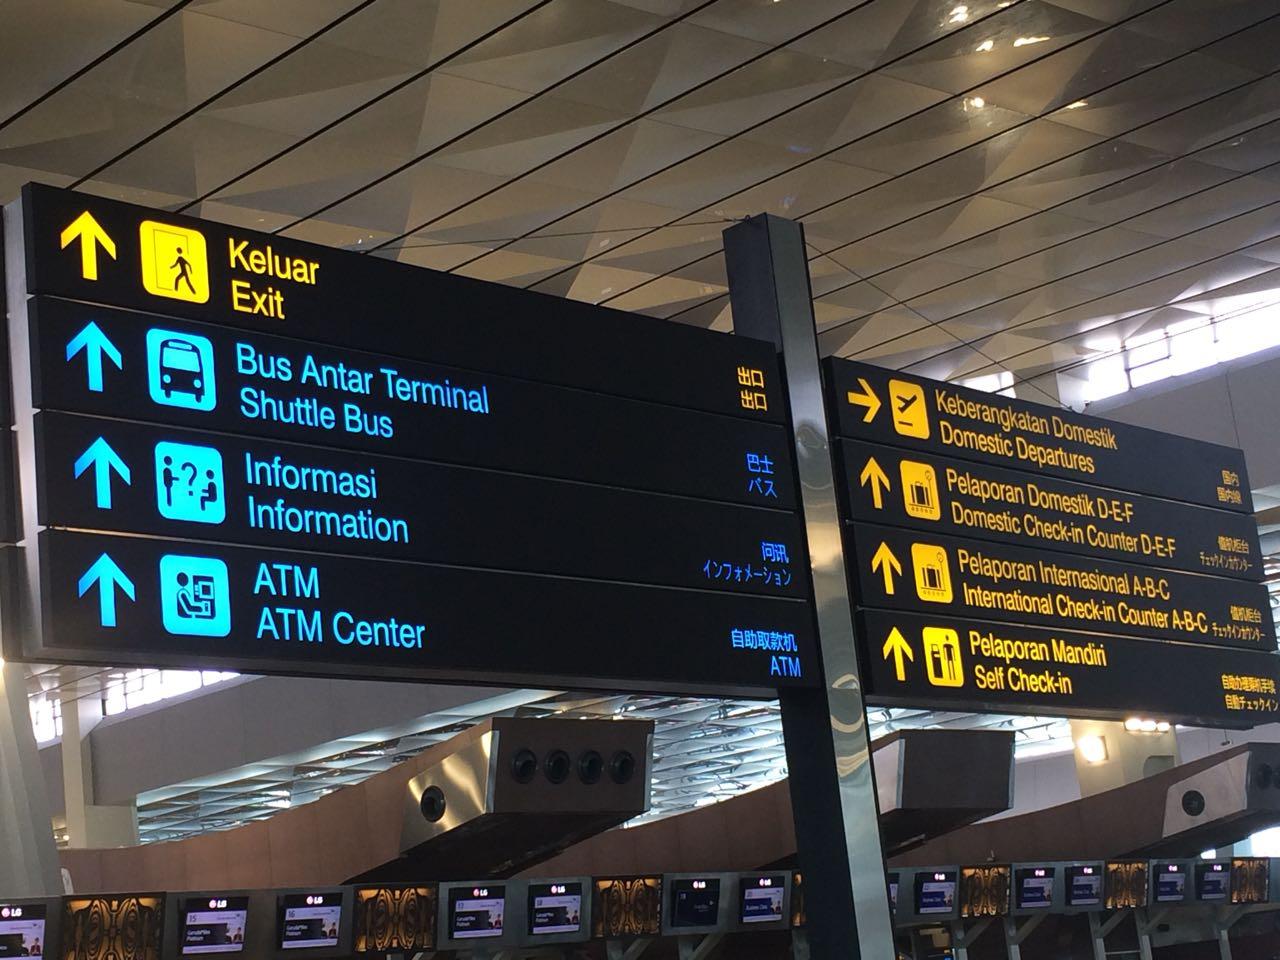 https: img.okezone.com content 2019 10 04 320 2113055 bandara-baru-yogyakarta-ditargetkan-selesai-akhir-tahun-GPOgXzkxpM.jpg